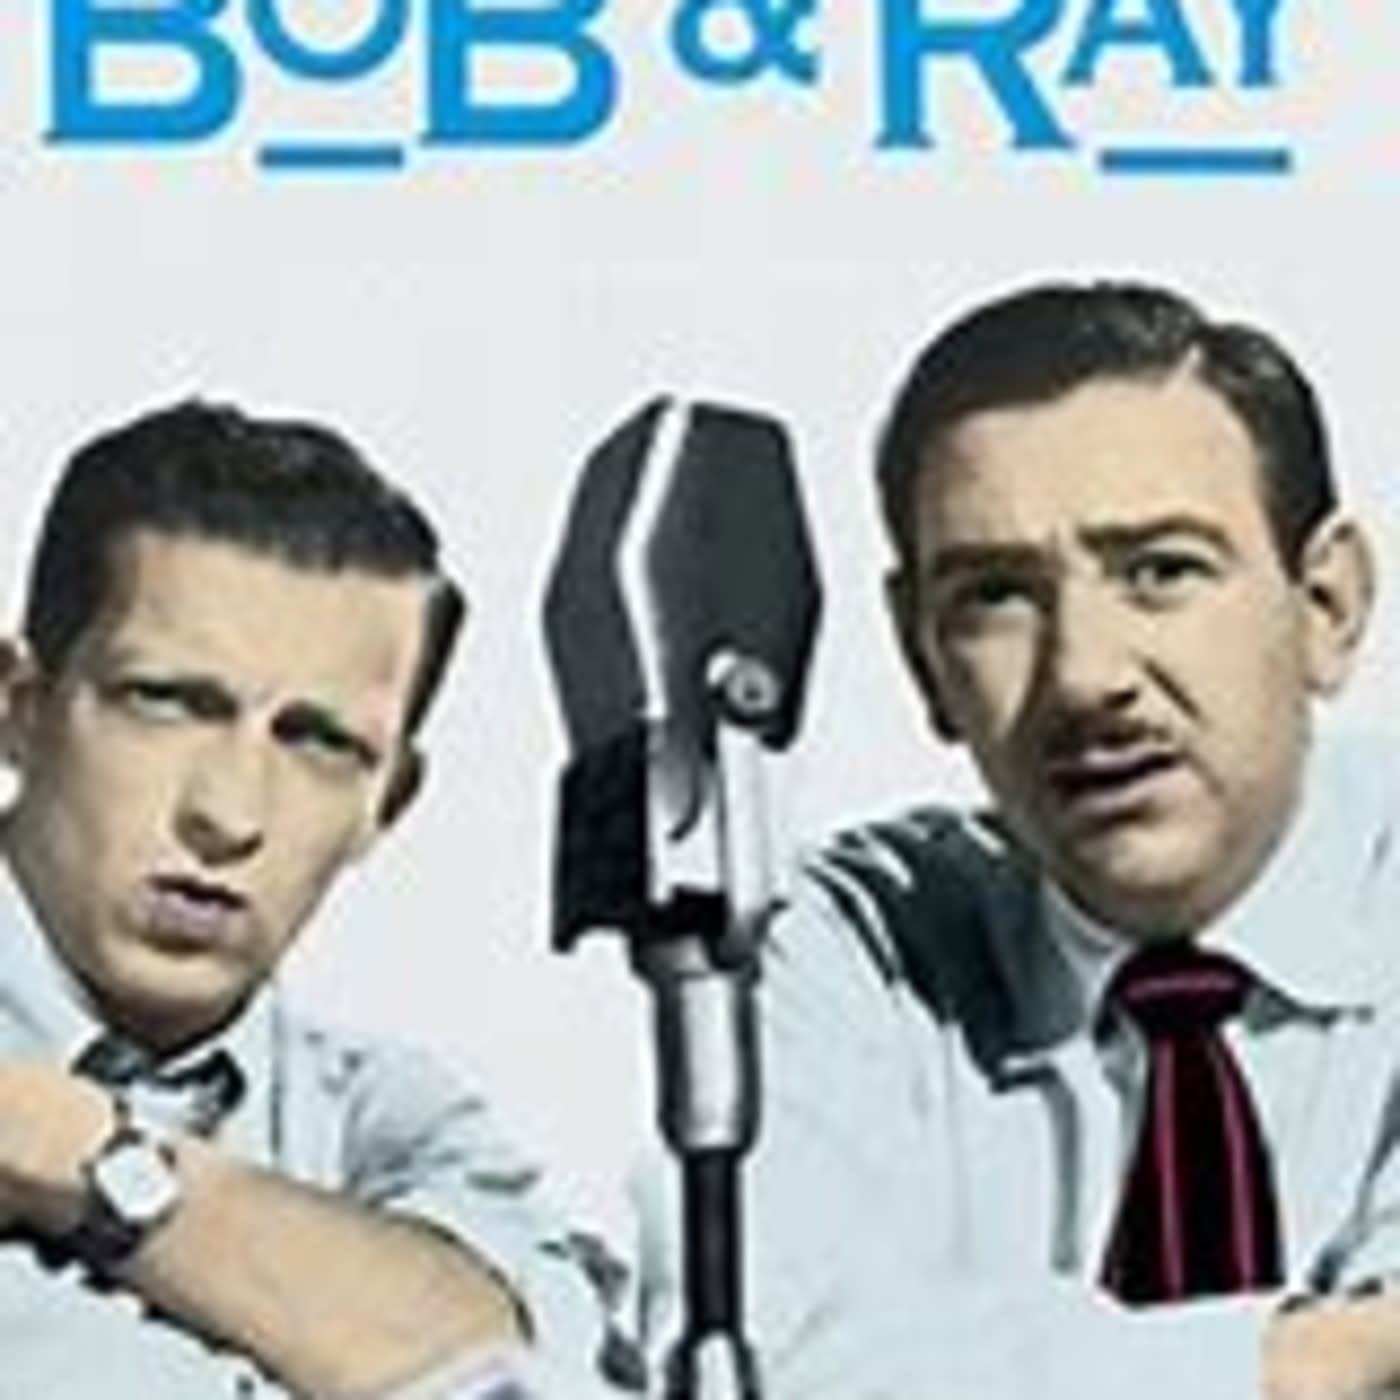 Bob and Ray Show 600331 Wally Ballou in Manh - 238